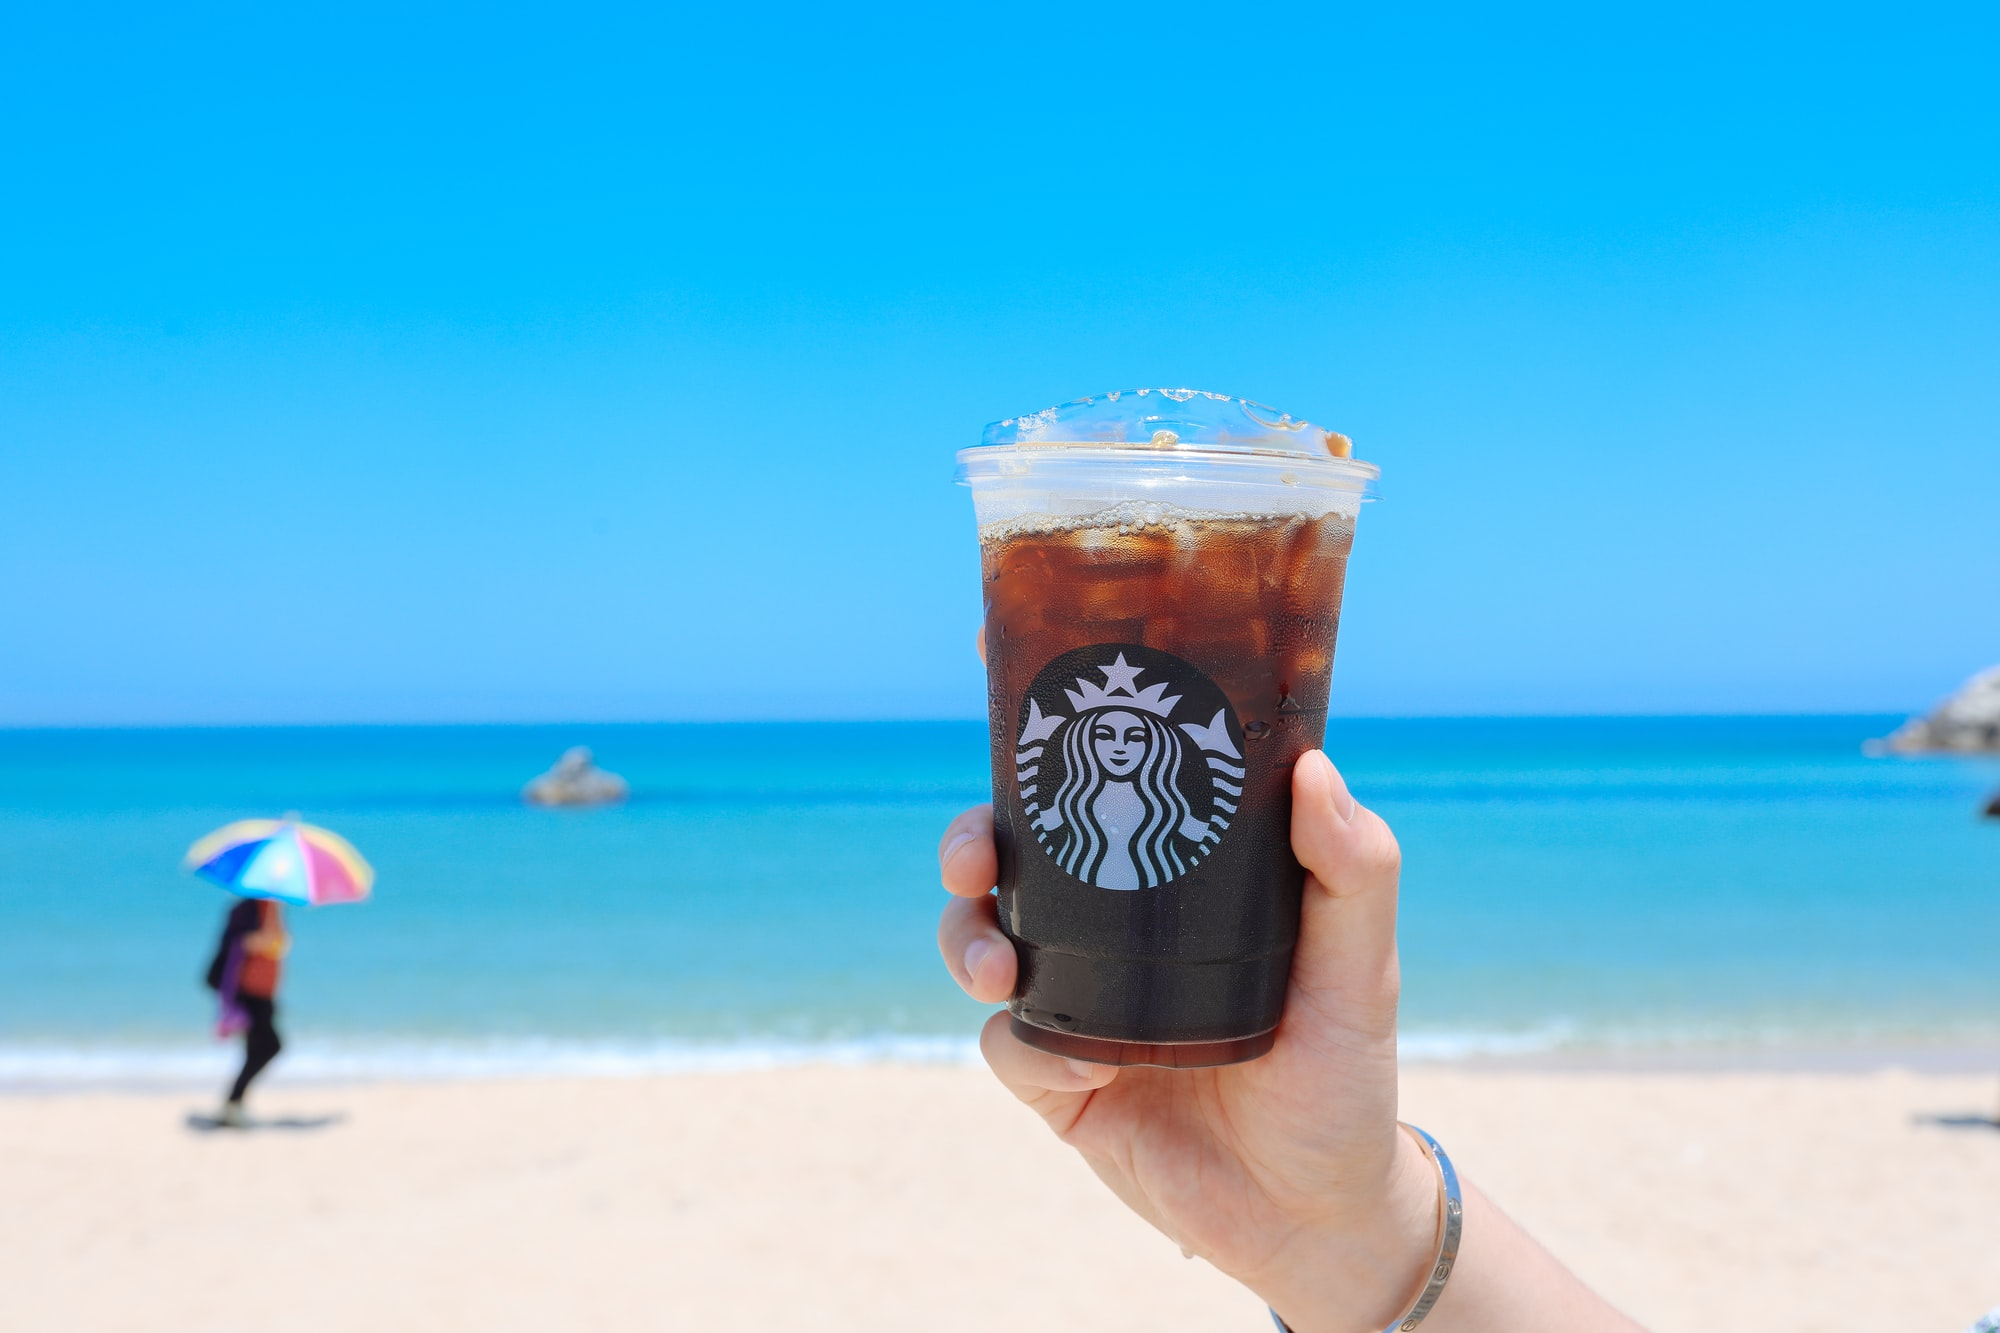 Summer beach in Gangwon-do, Korea